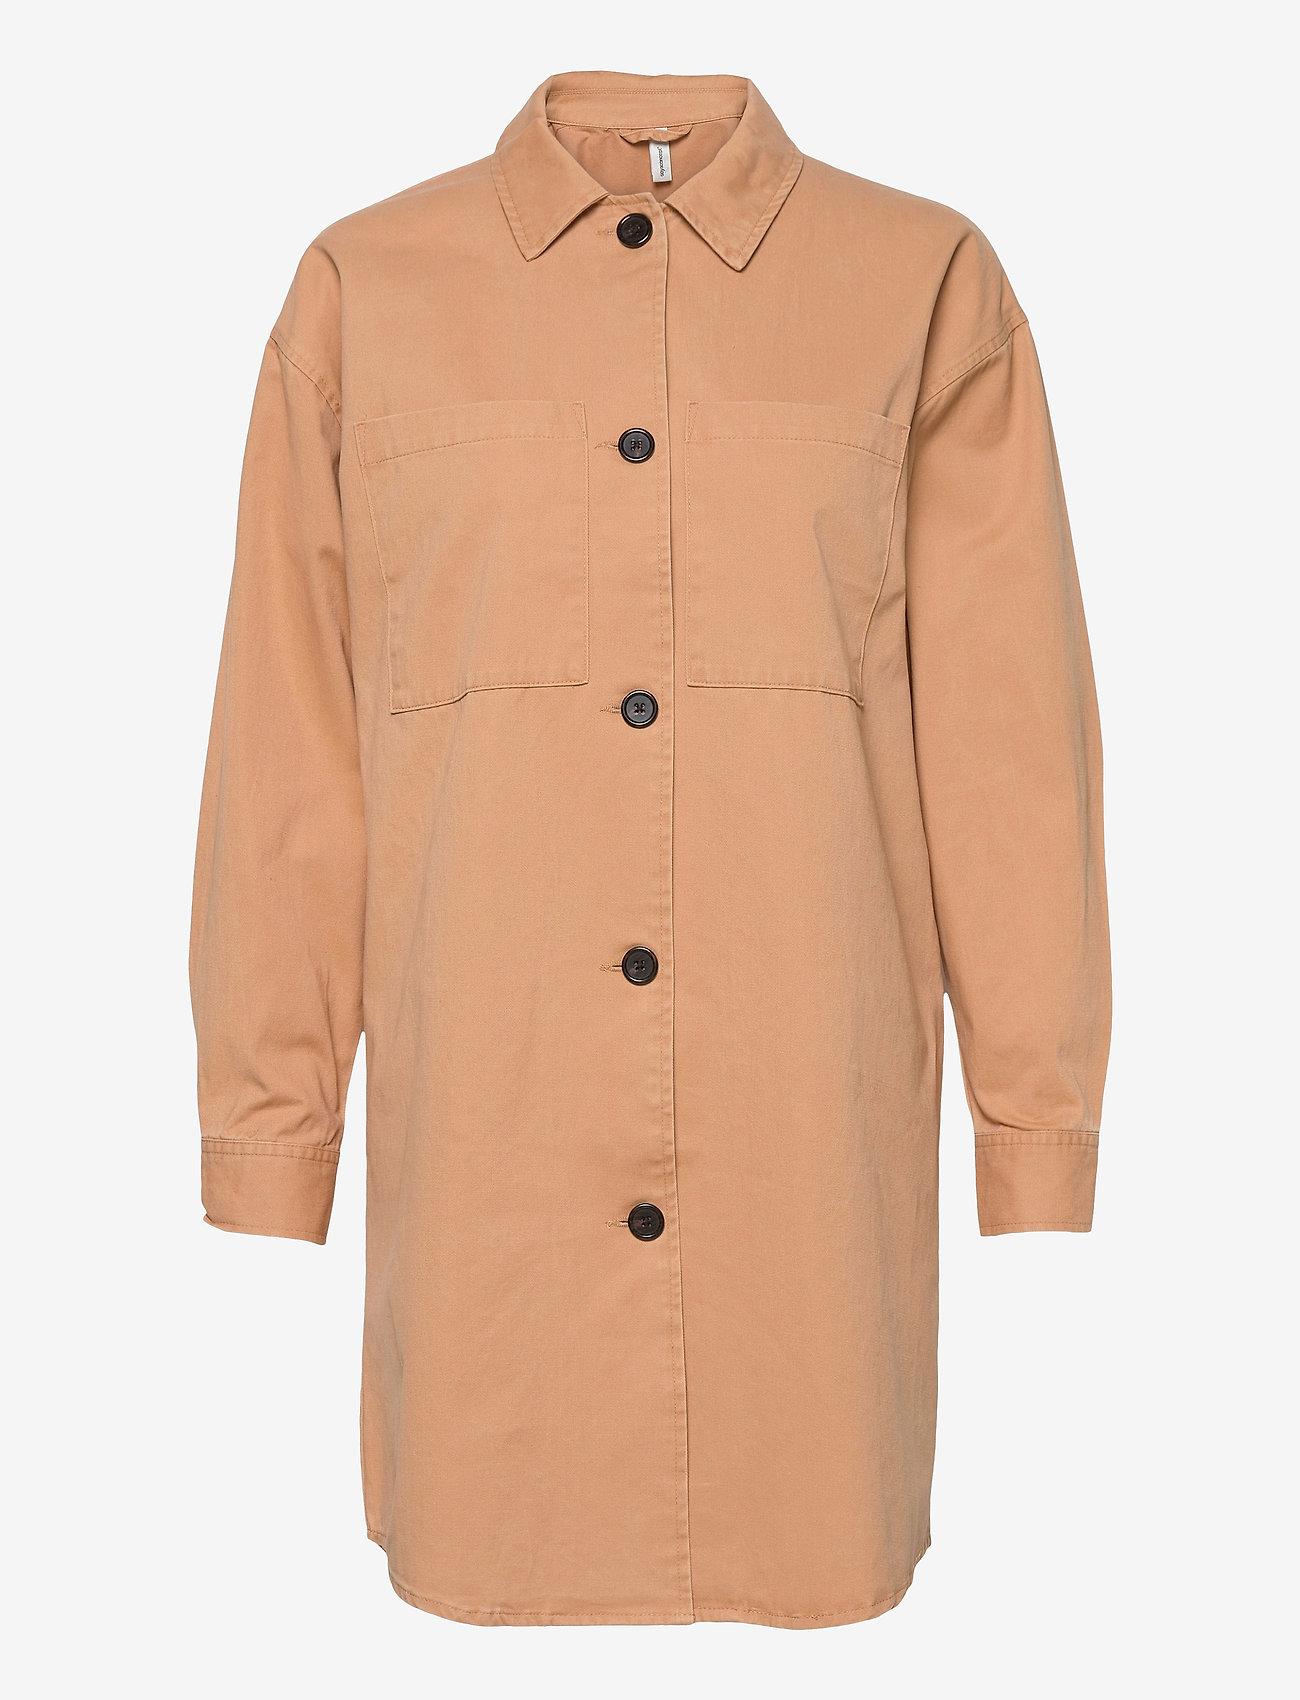 Soyaconcept - SC-ORION - light coats - biscuit - 0